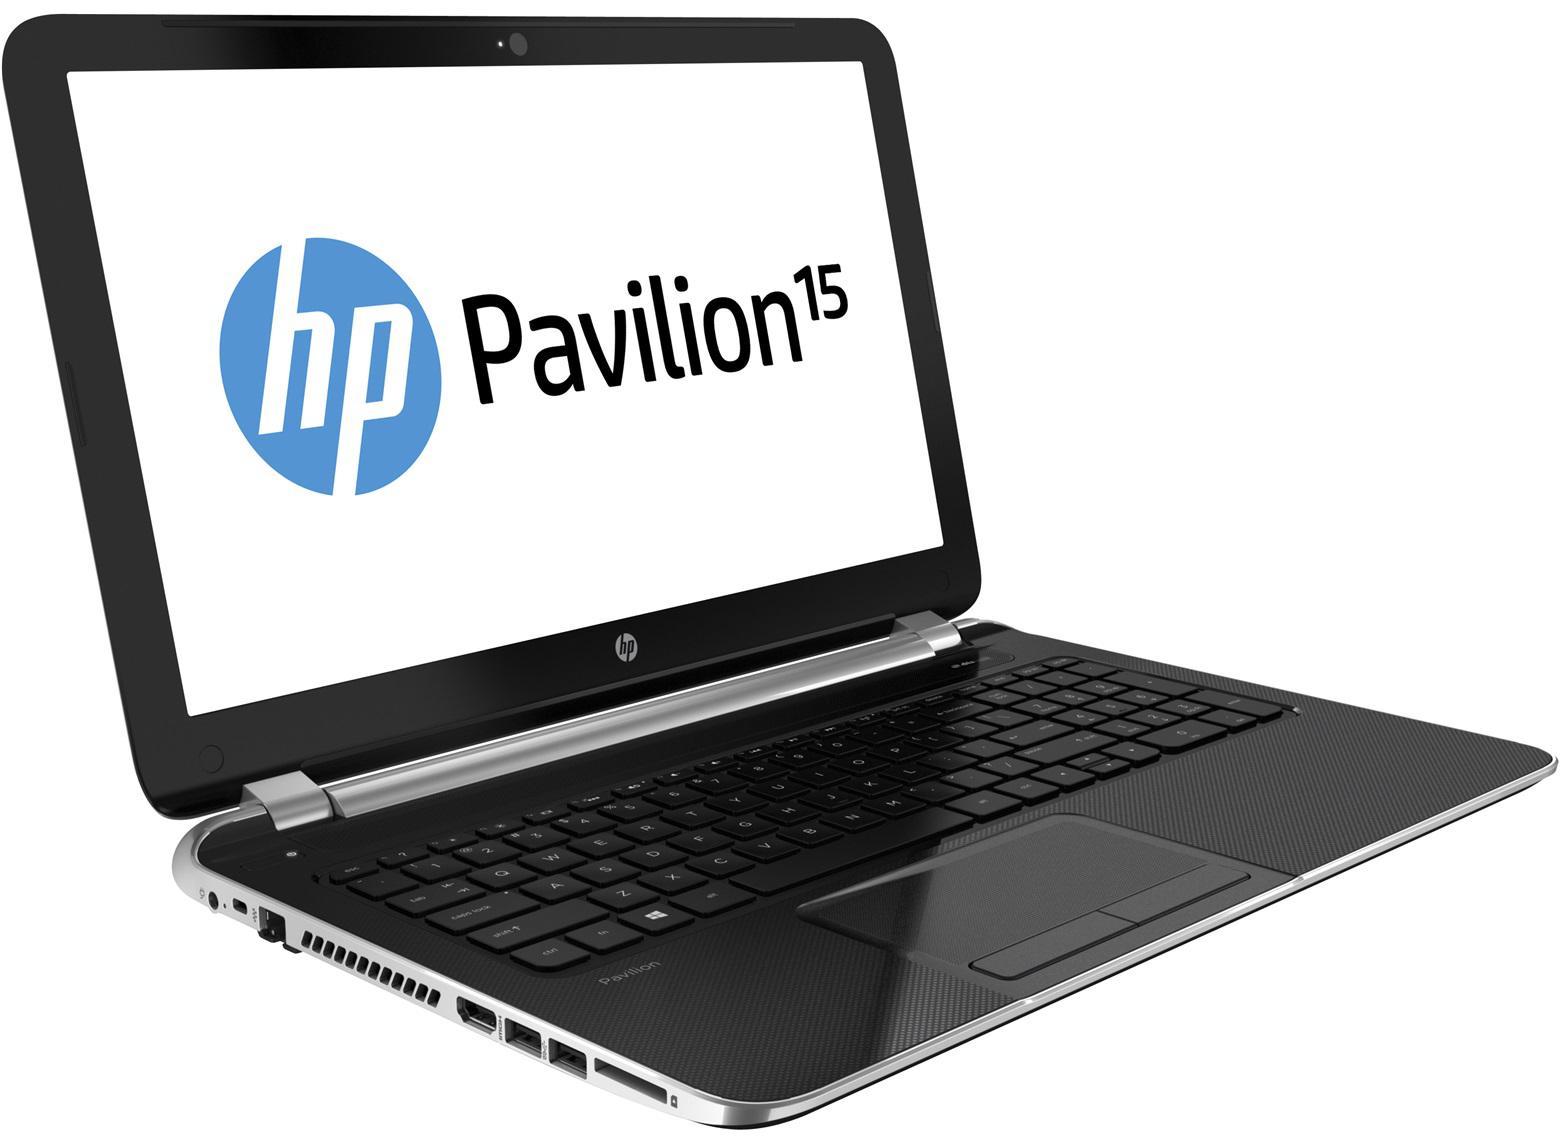 Ноутбук HP Pavilion 15-au128ur Z6K54EA (Intel Core i3-7100U 2.4 GHz/4096Mb/1000Gb/DVD-RW/Intel HD Graphics/Wi-Fi/Bluetooth/Cam/15.6/1366x768/Windows 10 64-bit)